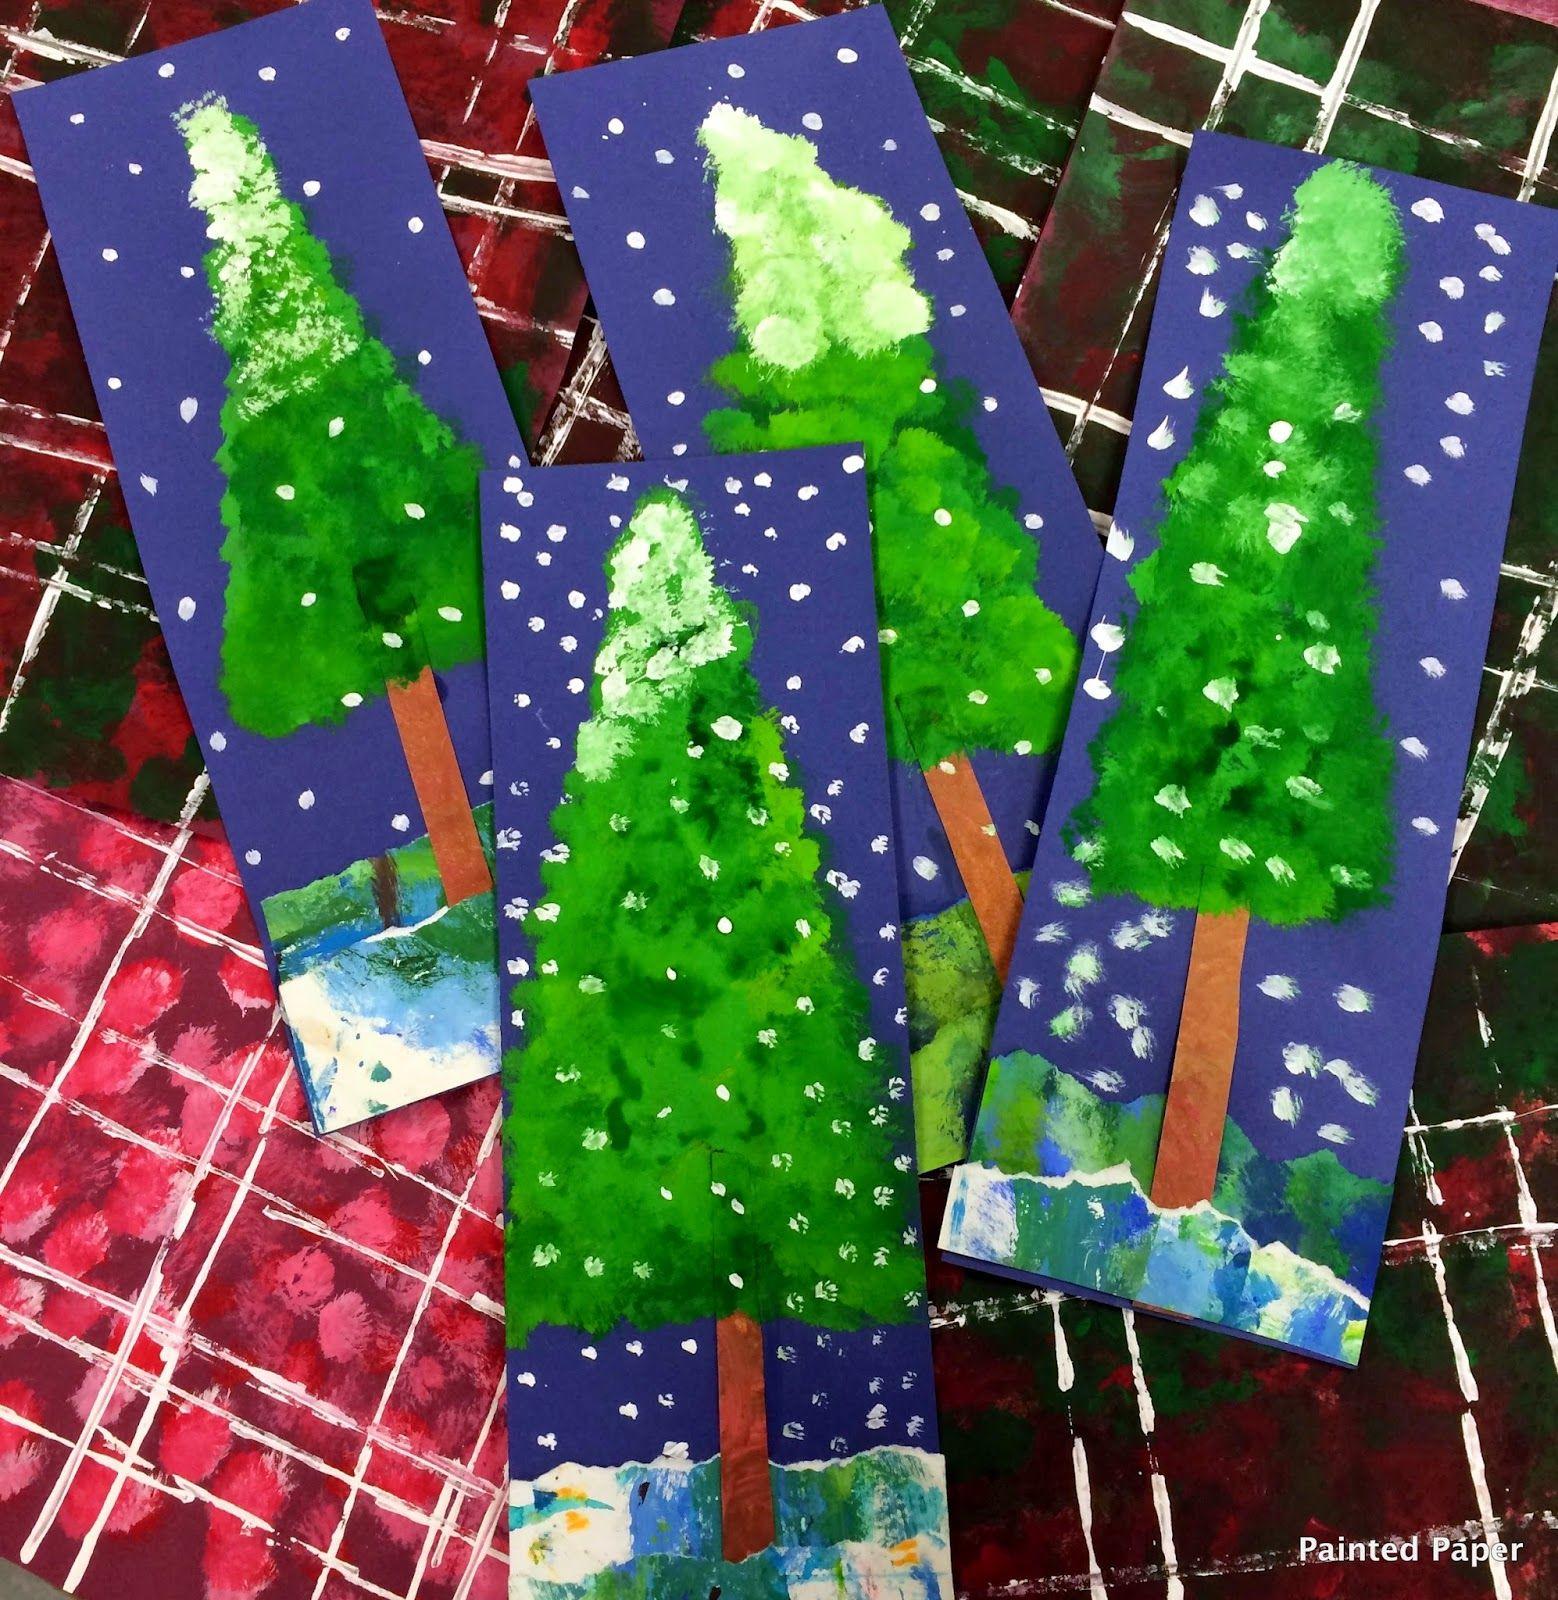 Black Glue Christmas Tree Art Project Fun Christmas Art Project For Kids Christmas Arts And Crafts Christmas Tree Art Kids Art Projects